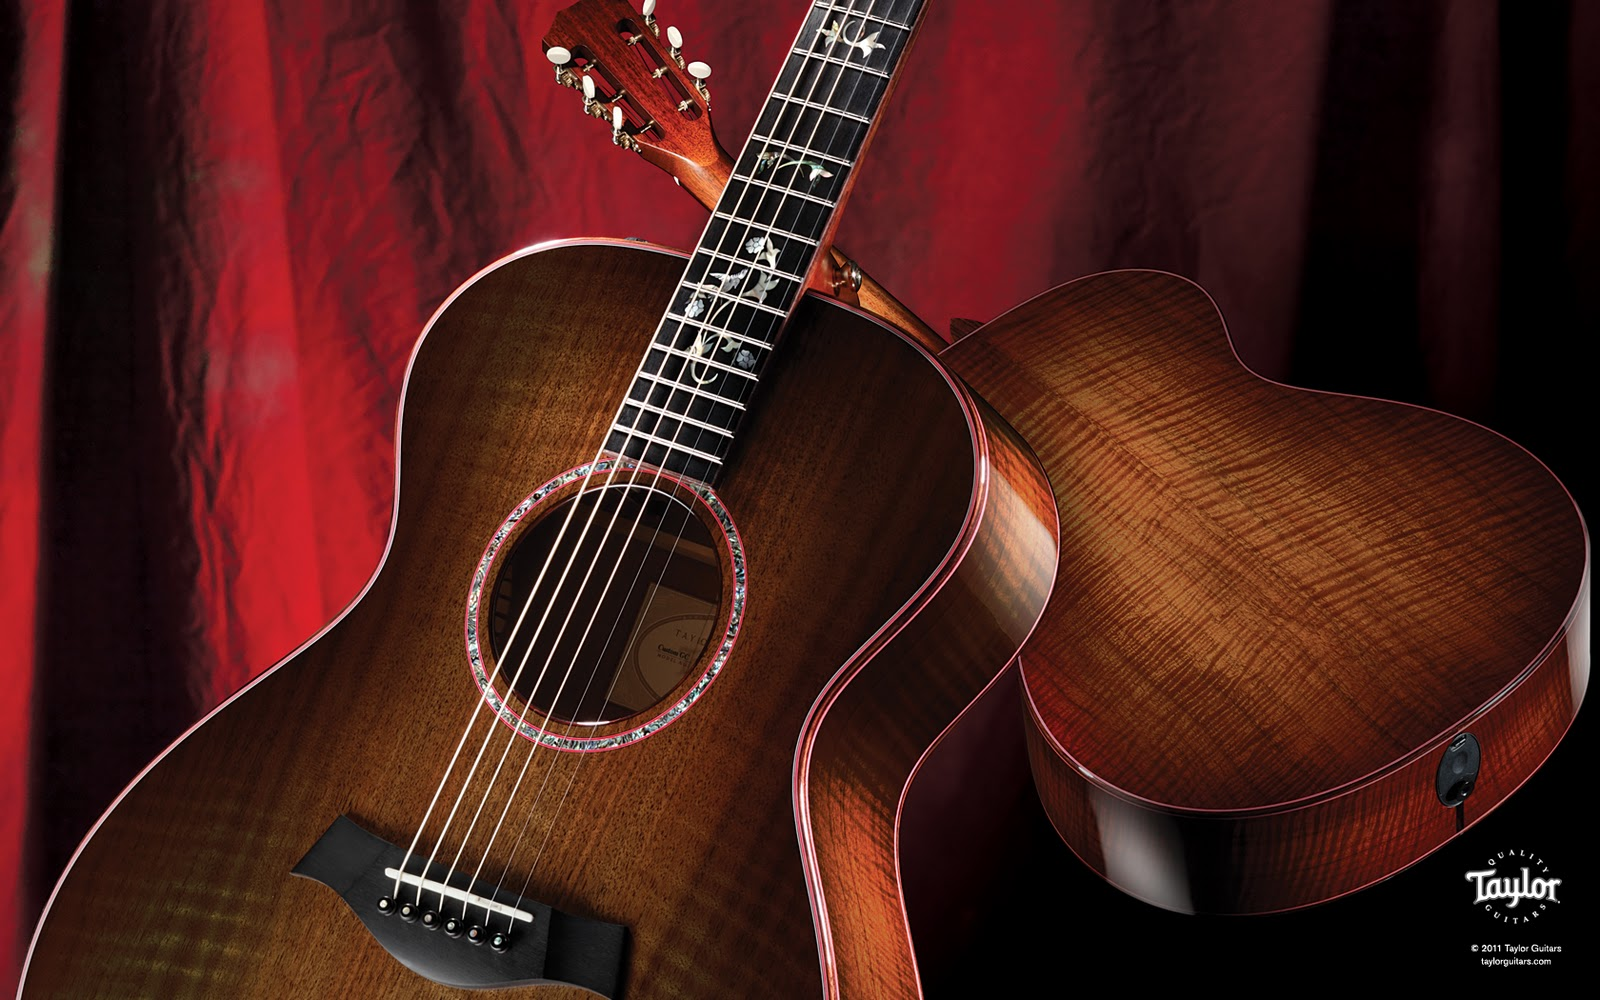 taylor guitars wallpapers - photo #9